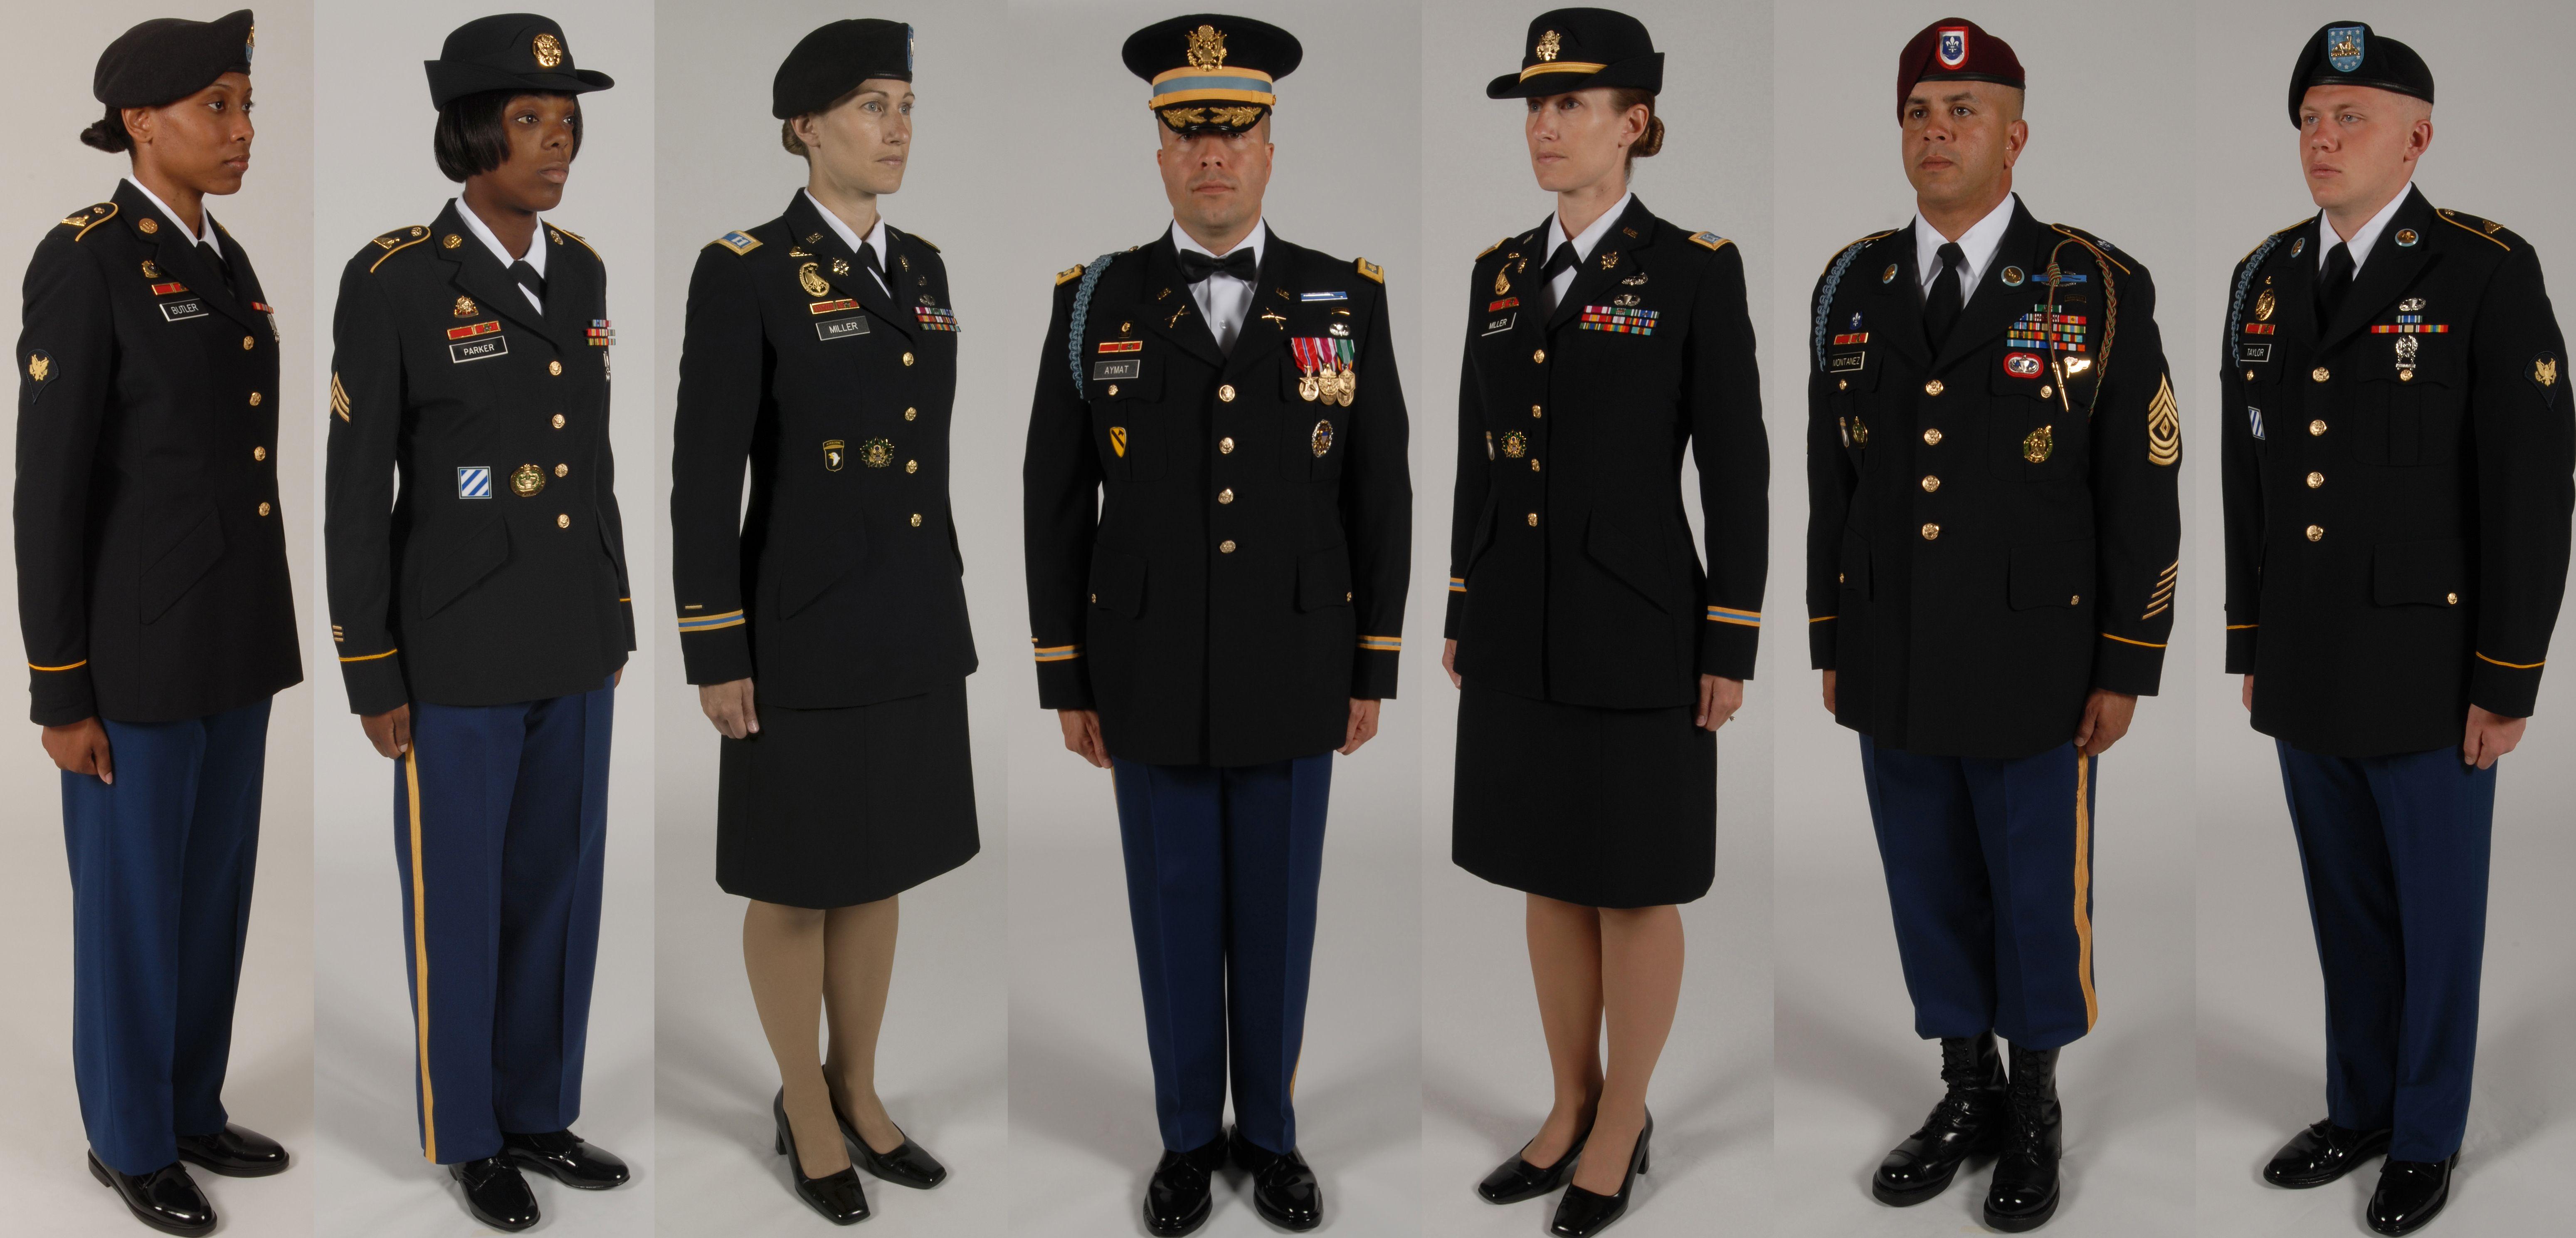 Us Army Dress Uniform: Wedding Army Dress Greens At Reisefeber.org